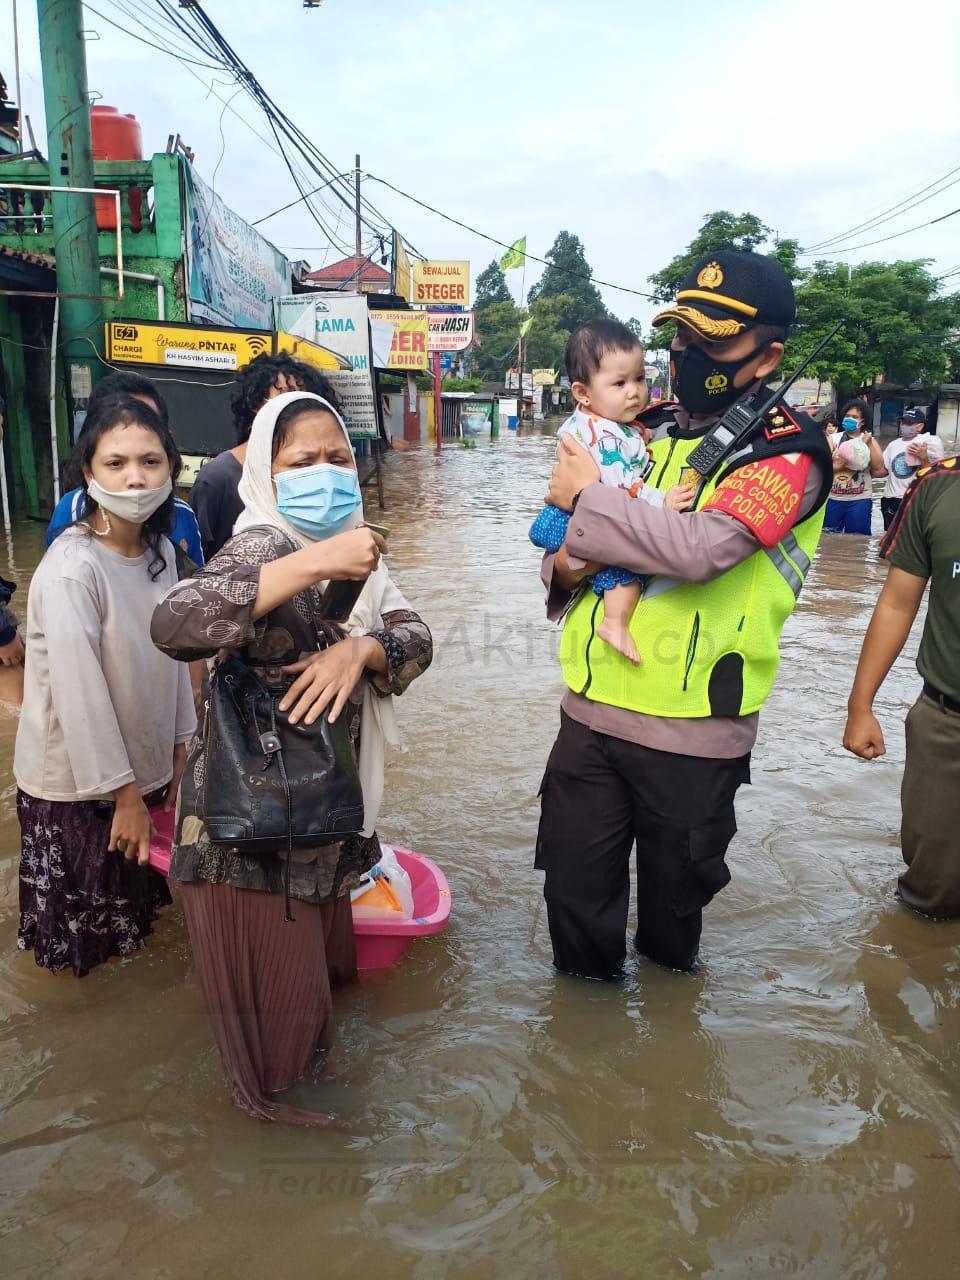 TNI-Polri Evakuasi Korban Banjir di Setiap Titik Wilayah DKI Jakarta 1 IMG 20210221 WA0037